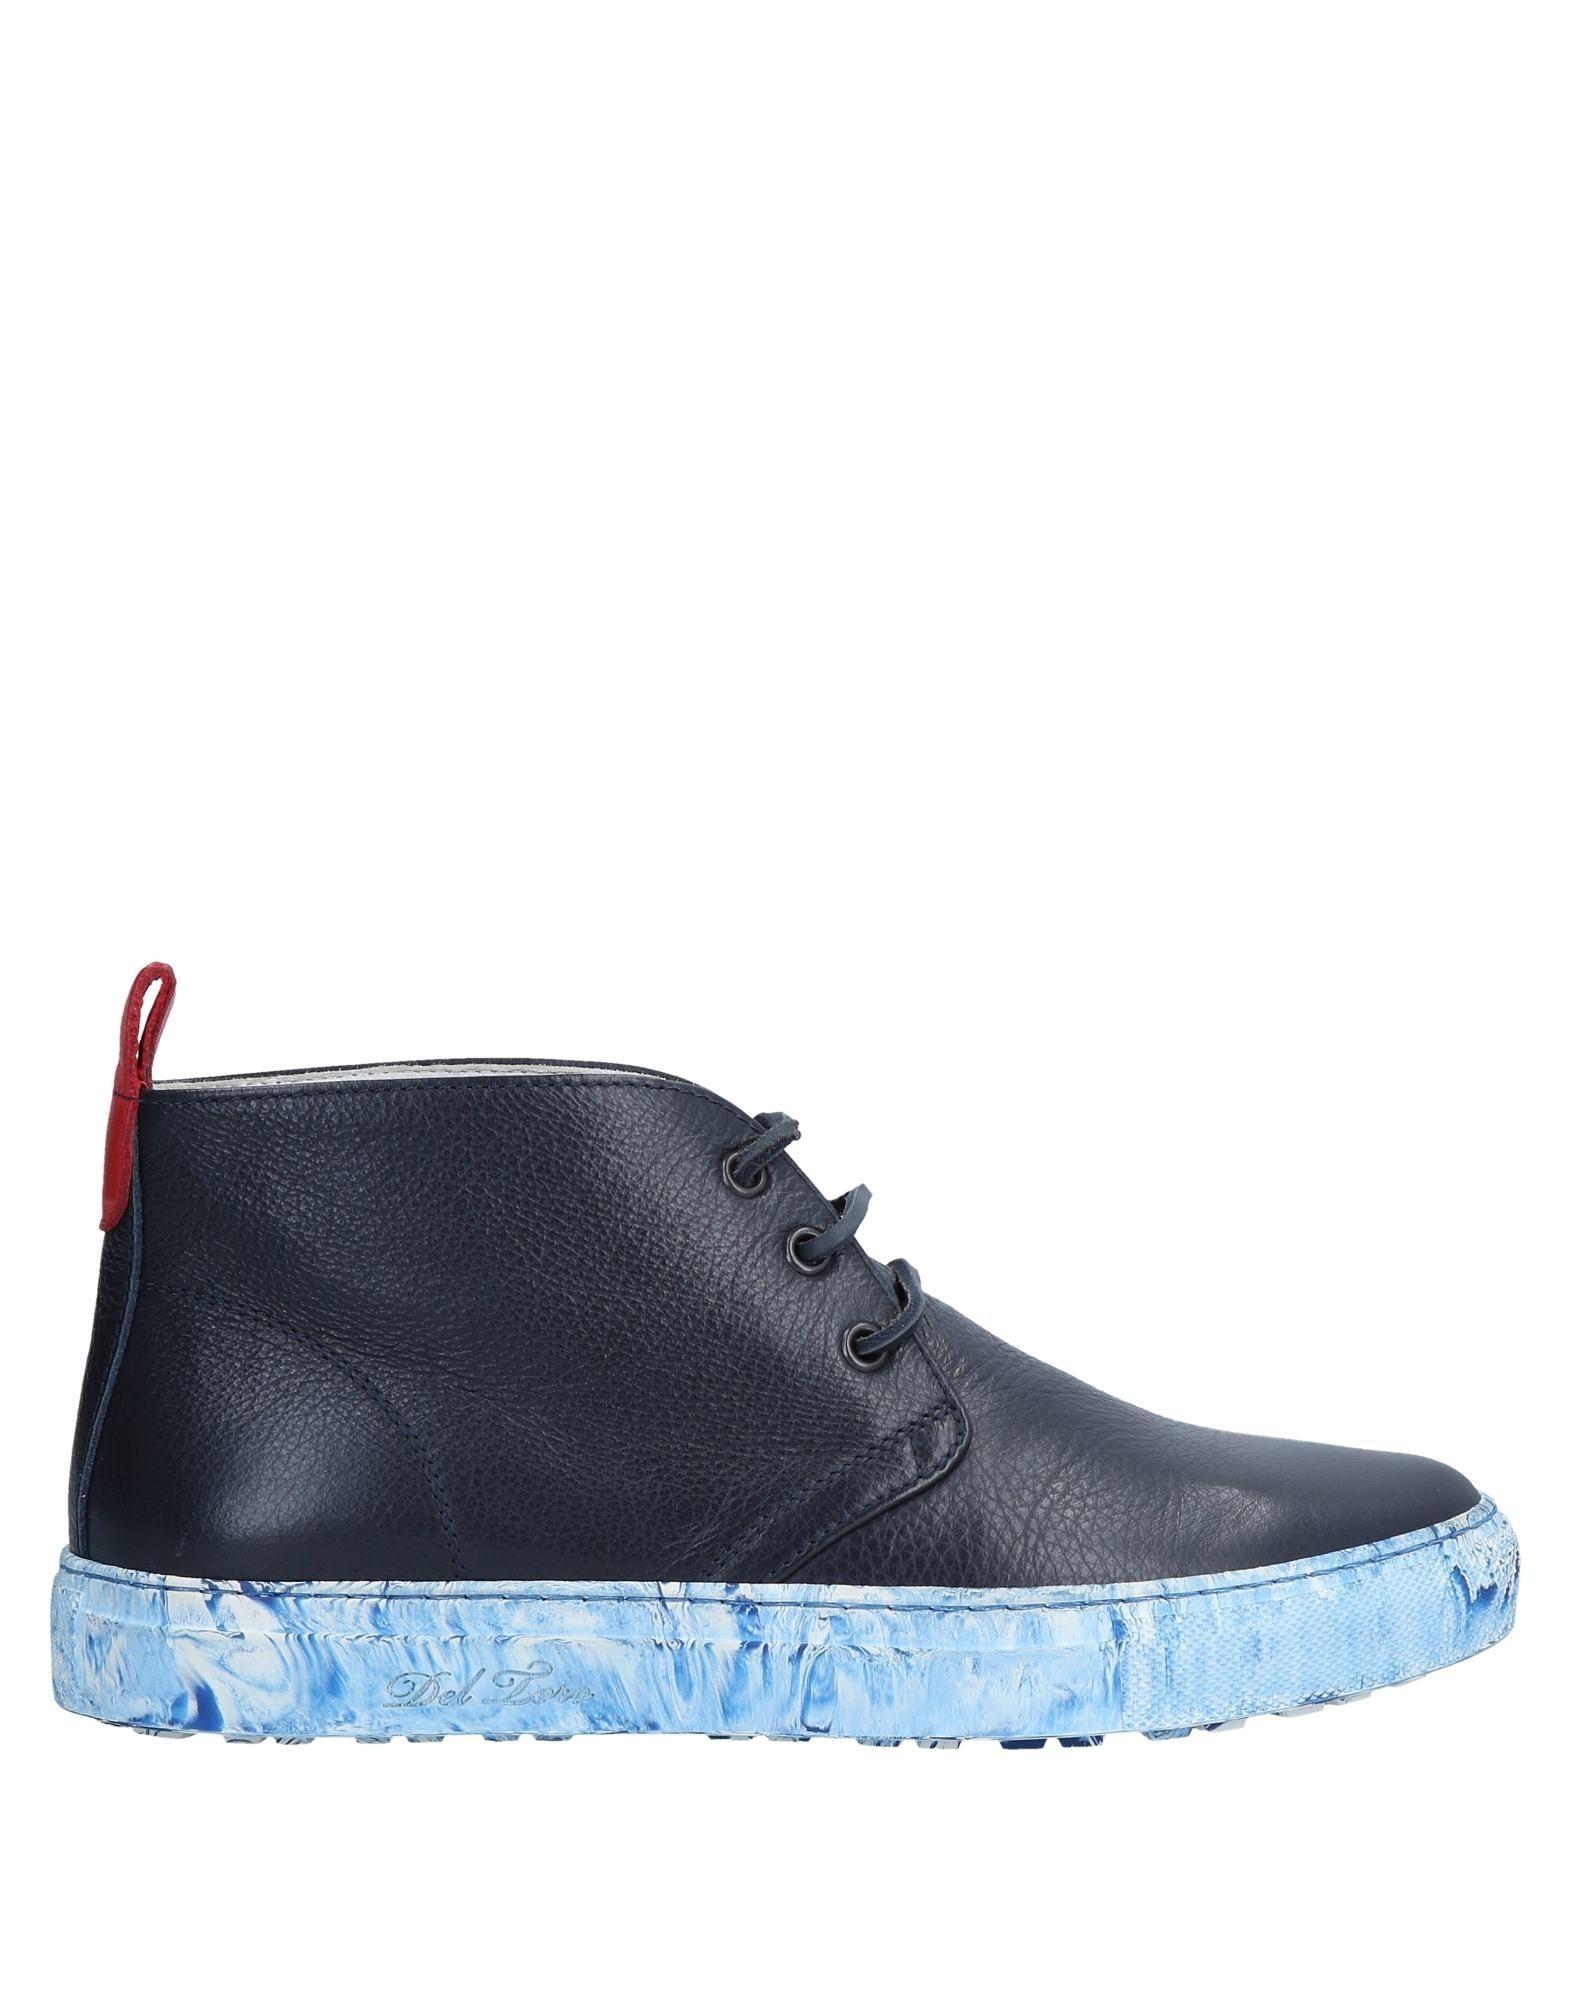 DEL TORO Полусапоги и высокие ботинки del toro высокие кеды и кроссовки